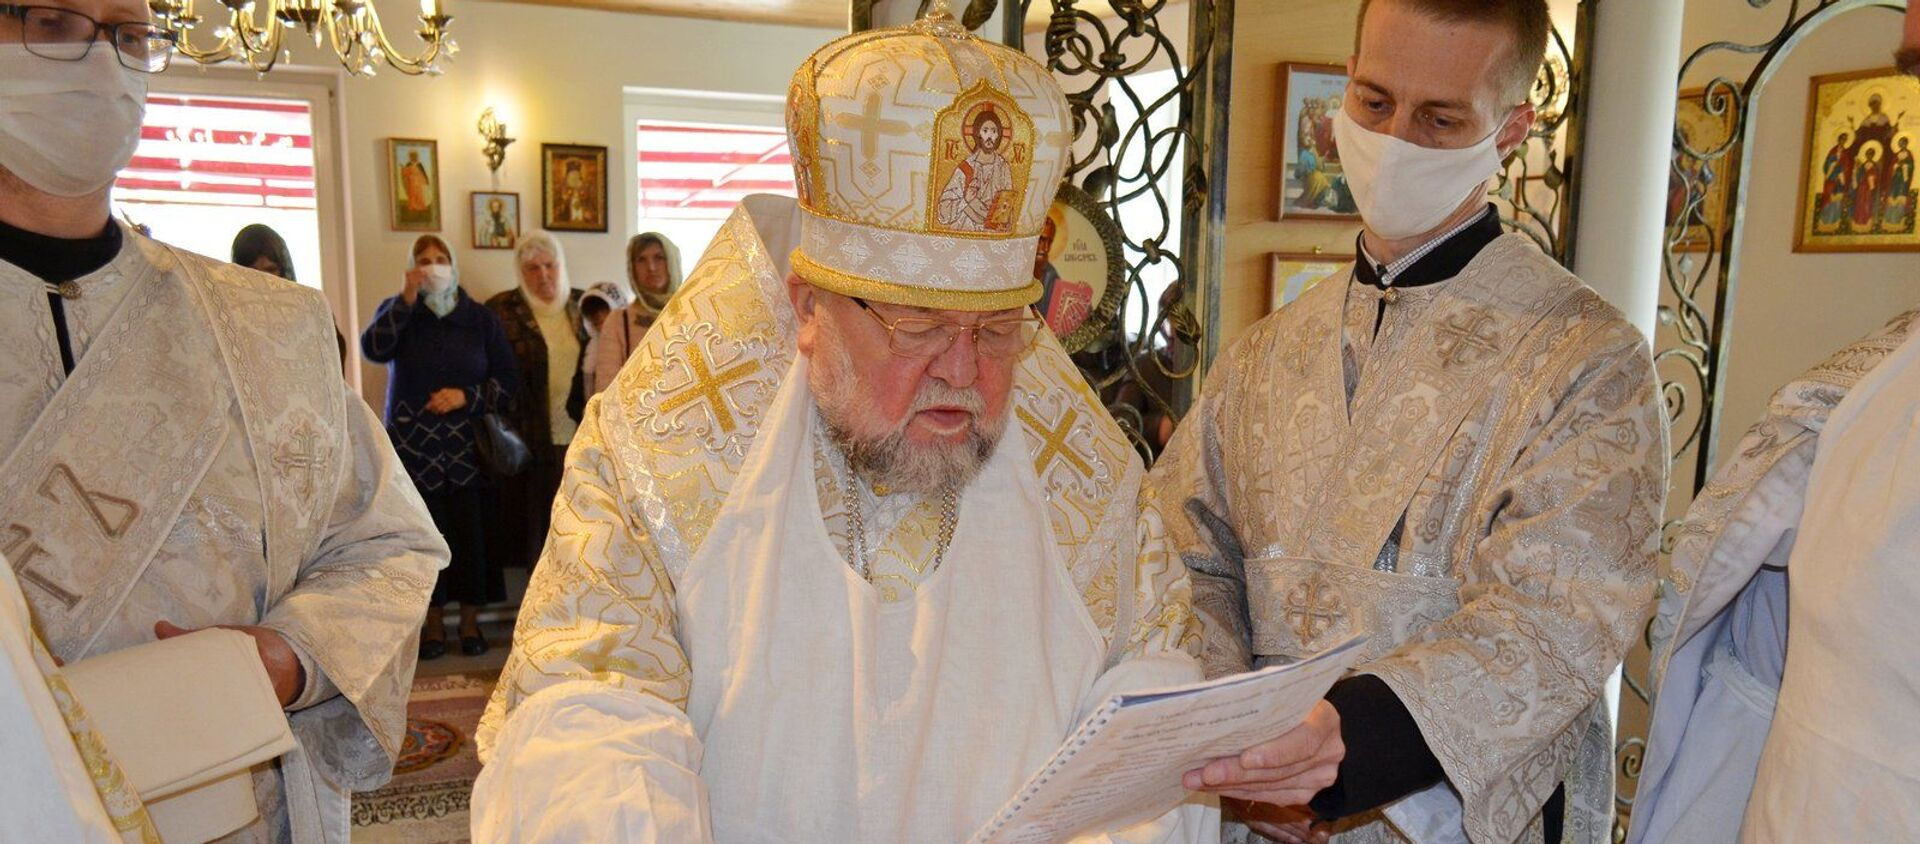 Архиепископ Артемий - Sputnik Беларусь, 1920, 09.06.2021